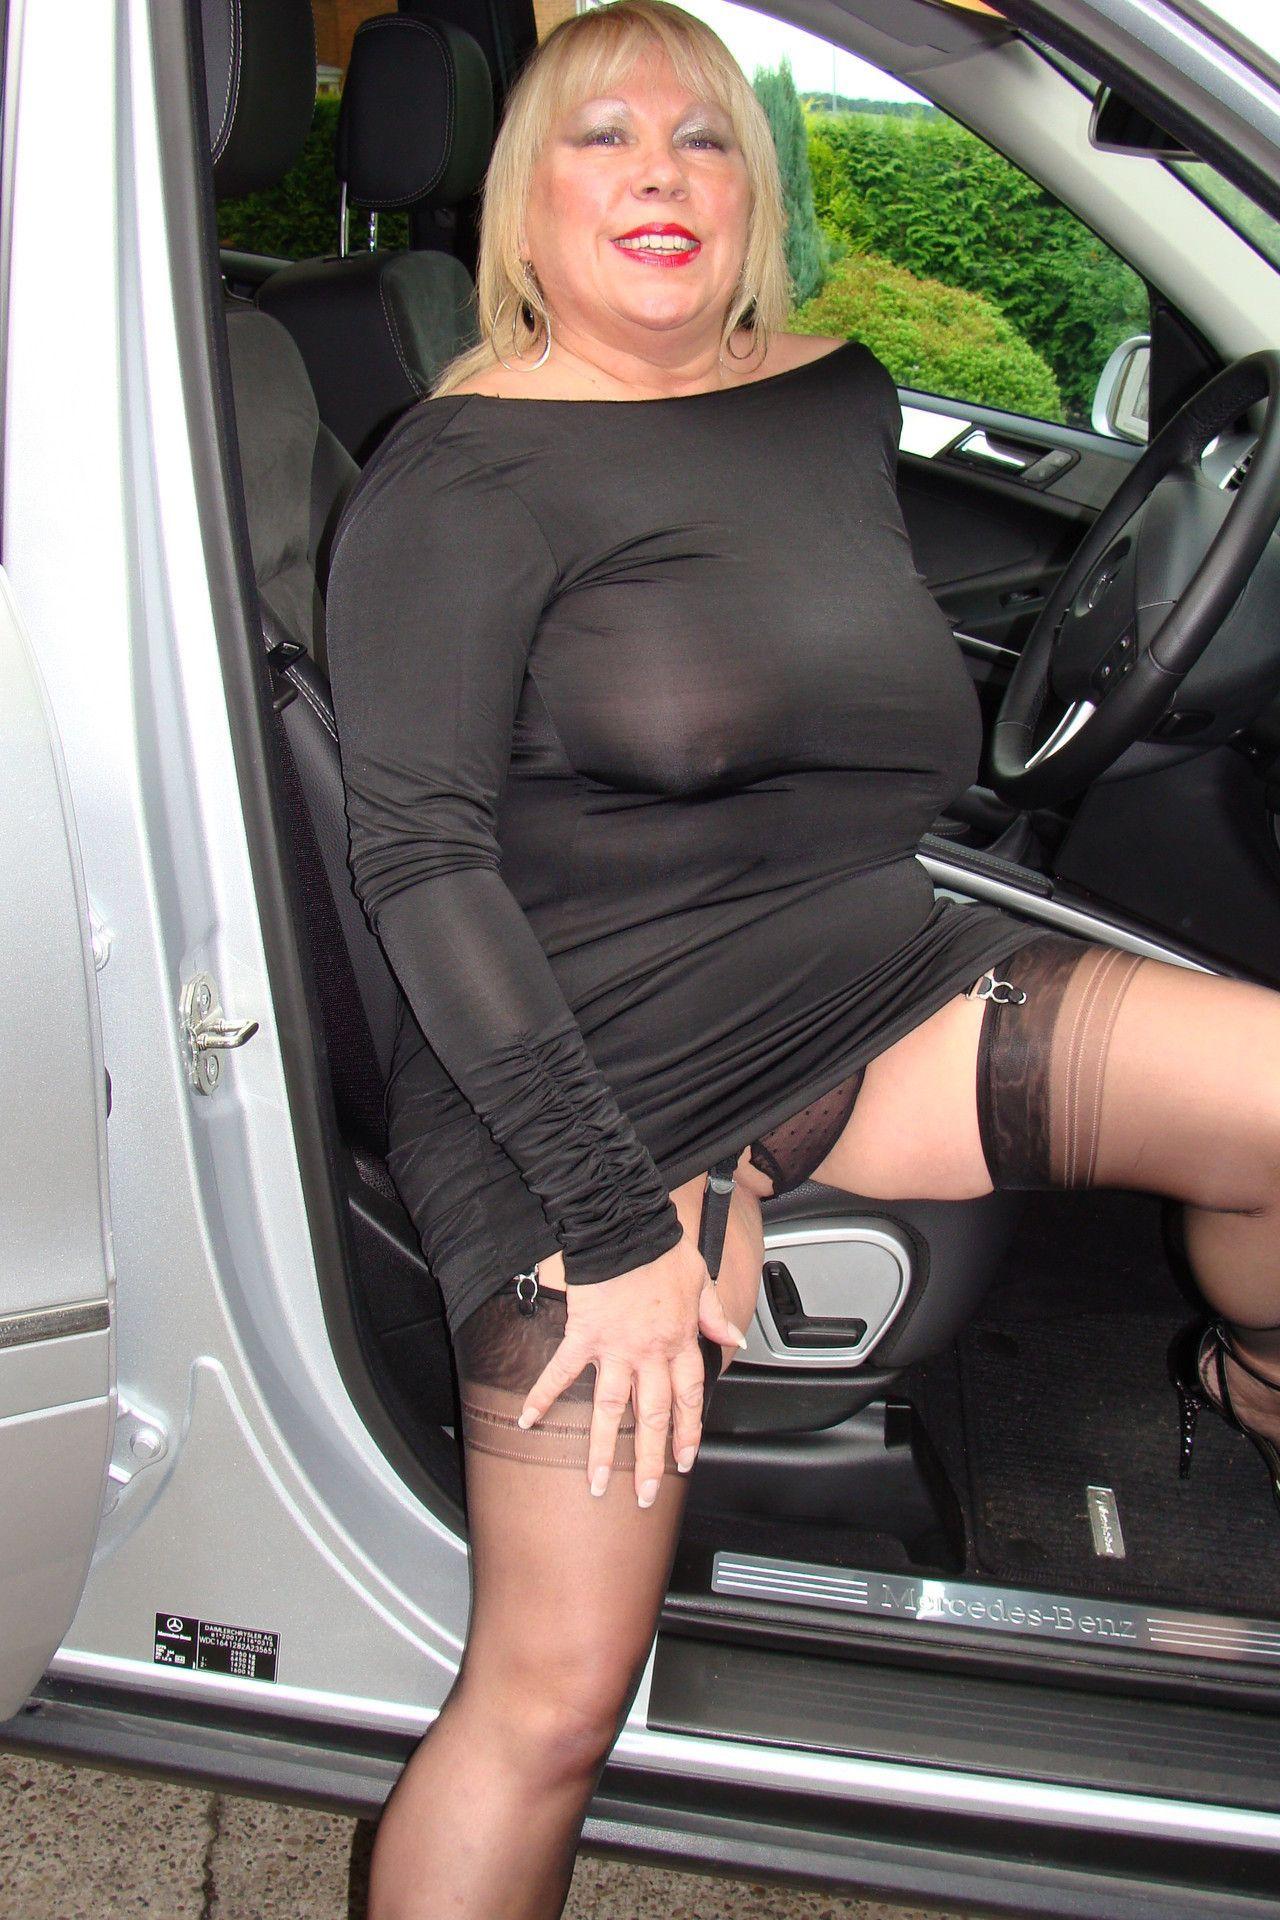 Pretty mexican girl sucking cock